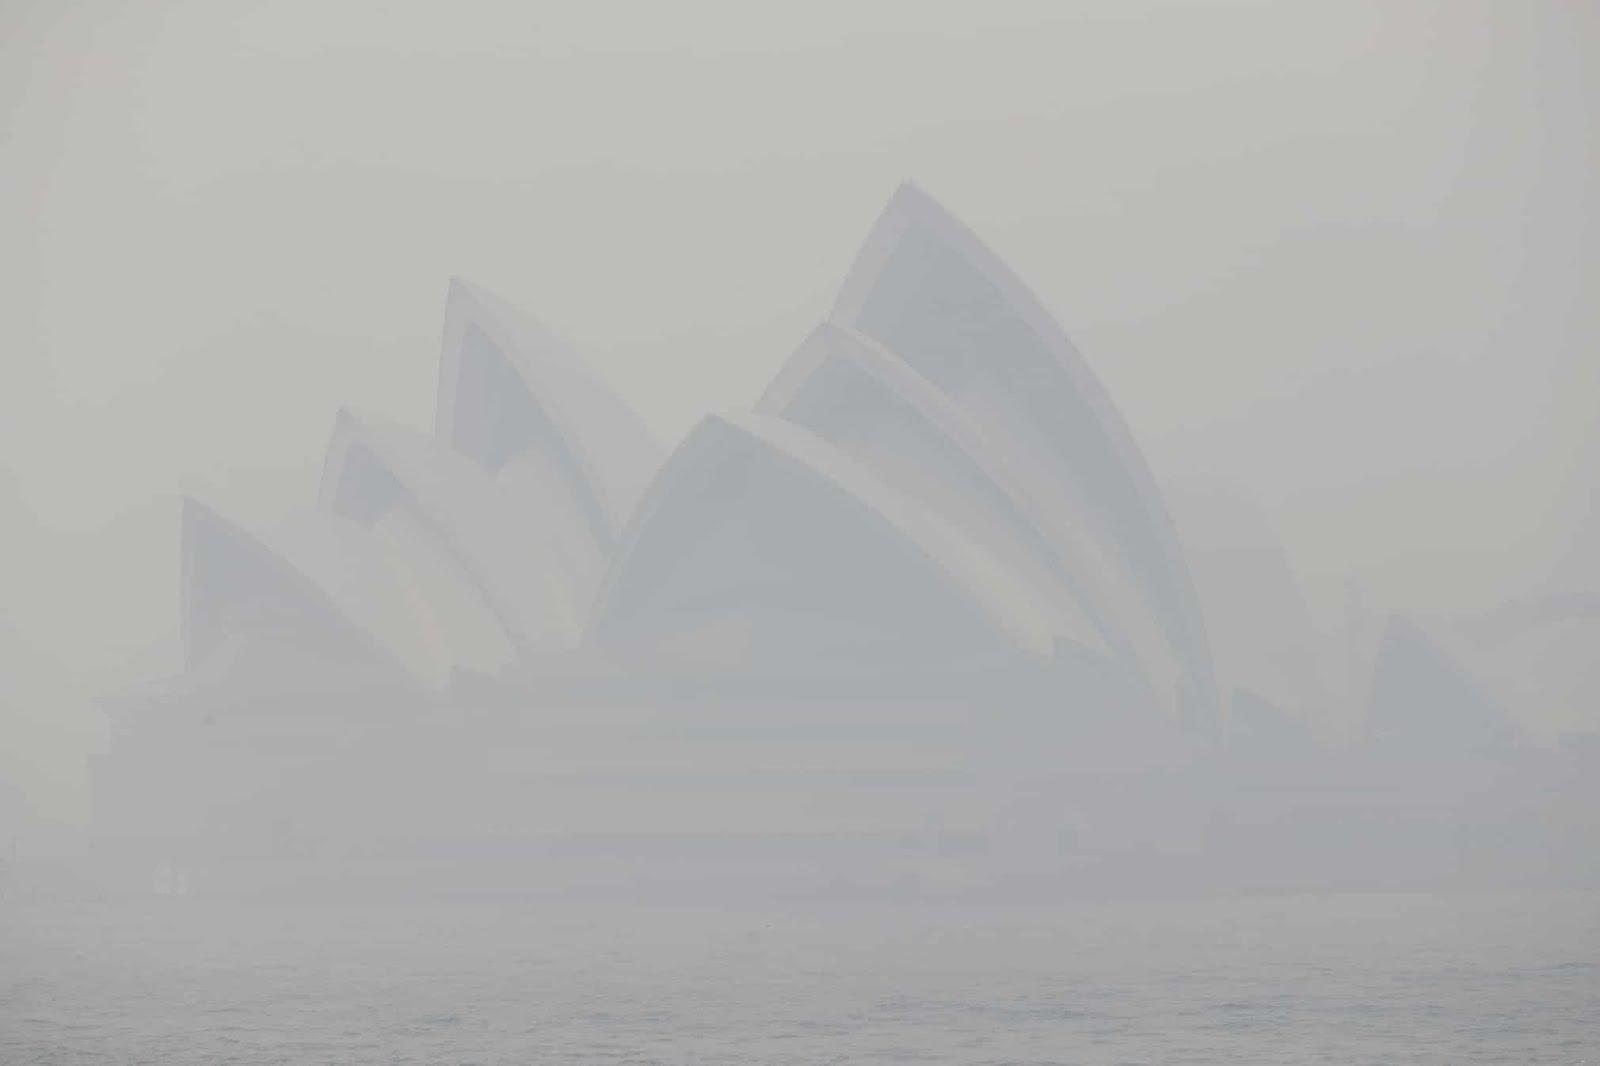 Sydney on fire